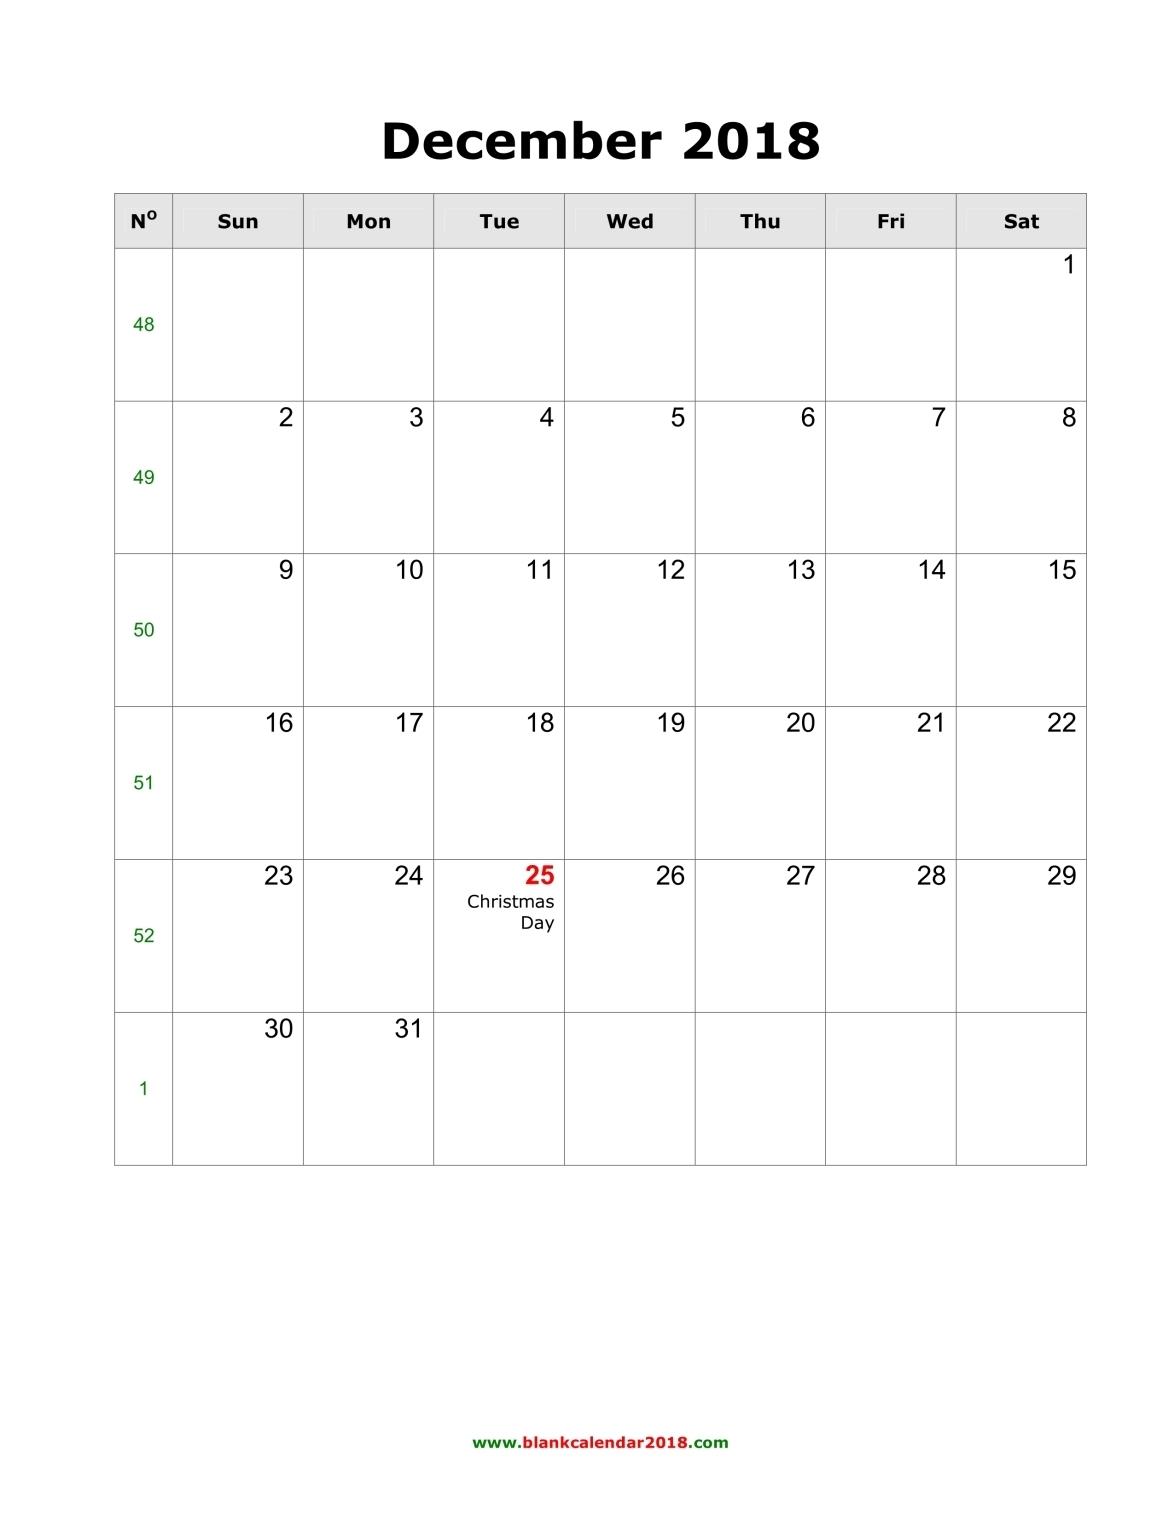 Blank Calendar For December 2018 throughout December Blank Monthly Calendar